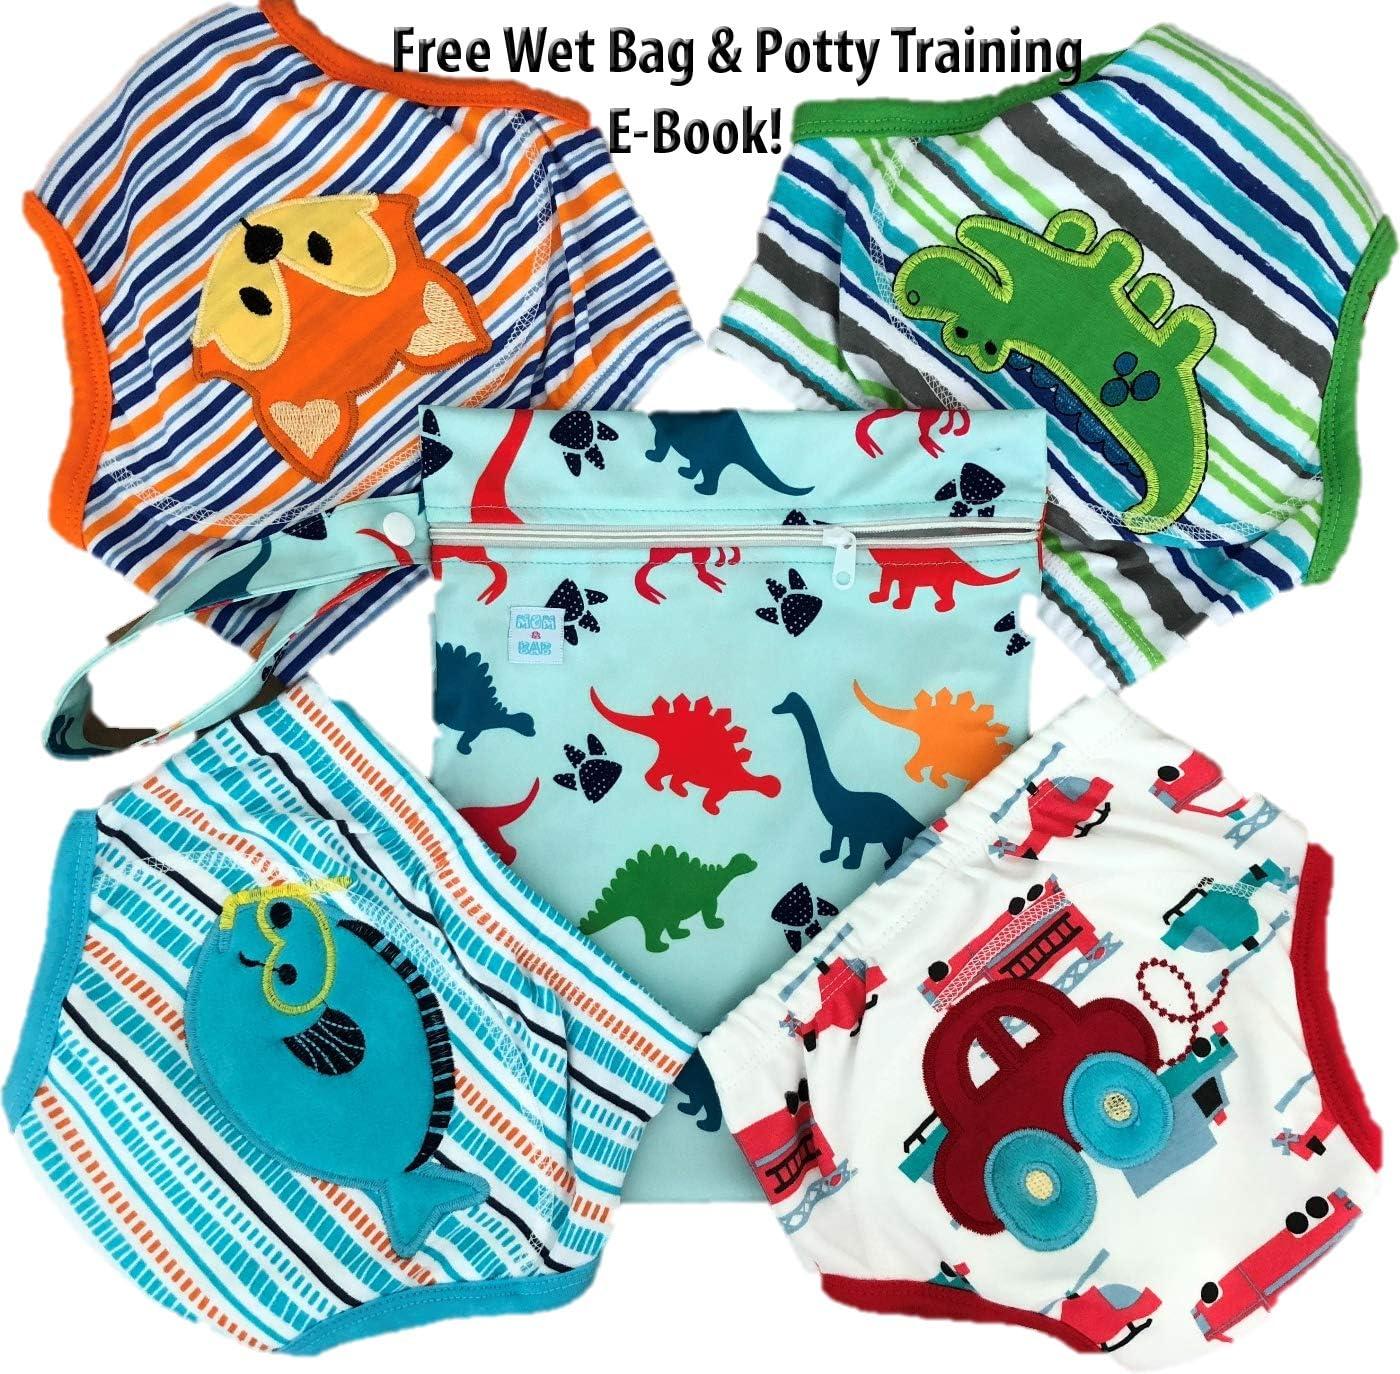 Cute Animal Sleeping Bag for Kids Pink Cat 138 x 50cm Xiaoxingyun Play Pillow Foldable Soft Fun Sleeping Bag